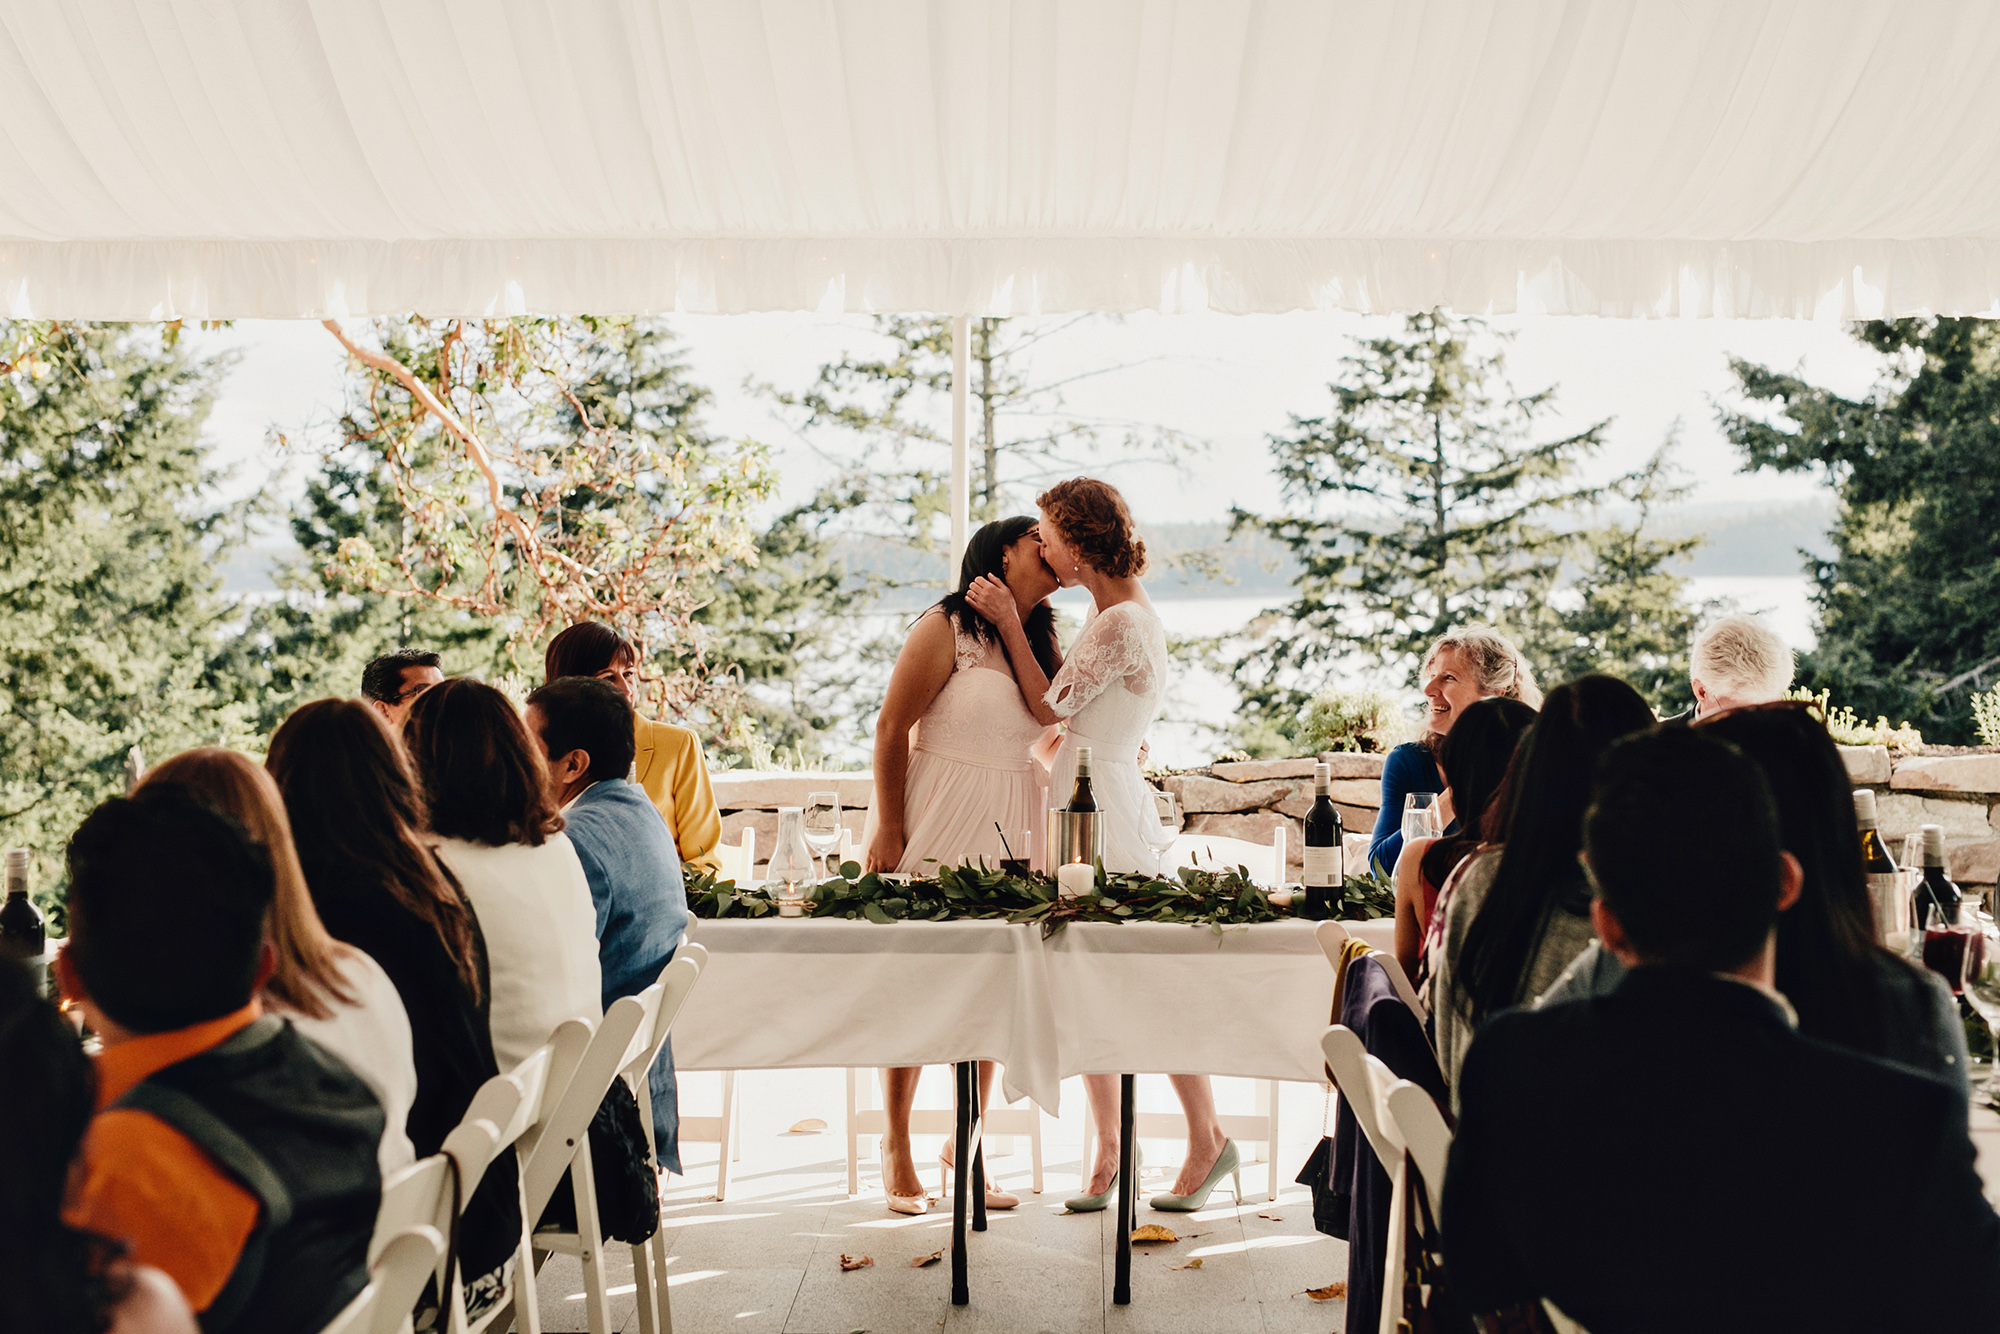 taylor-roades-weddings-0002A.JPG